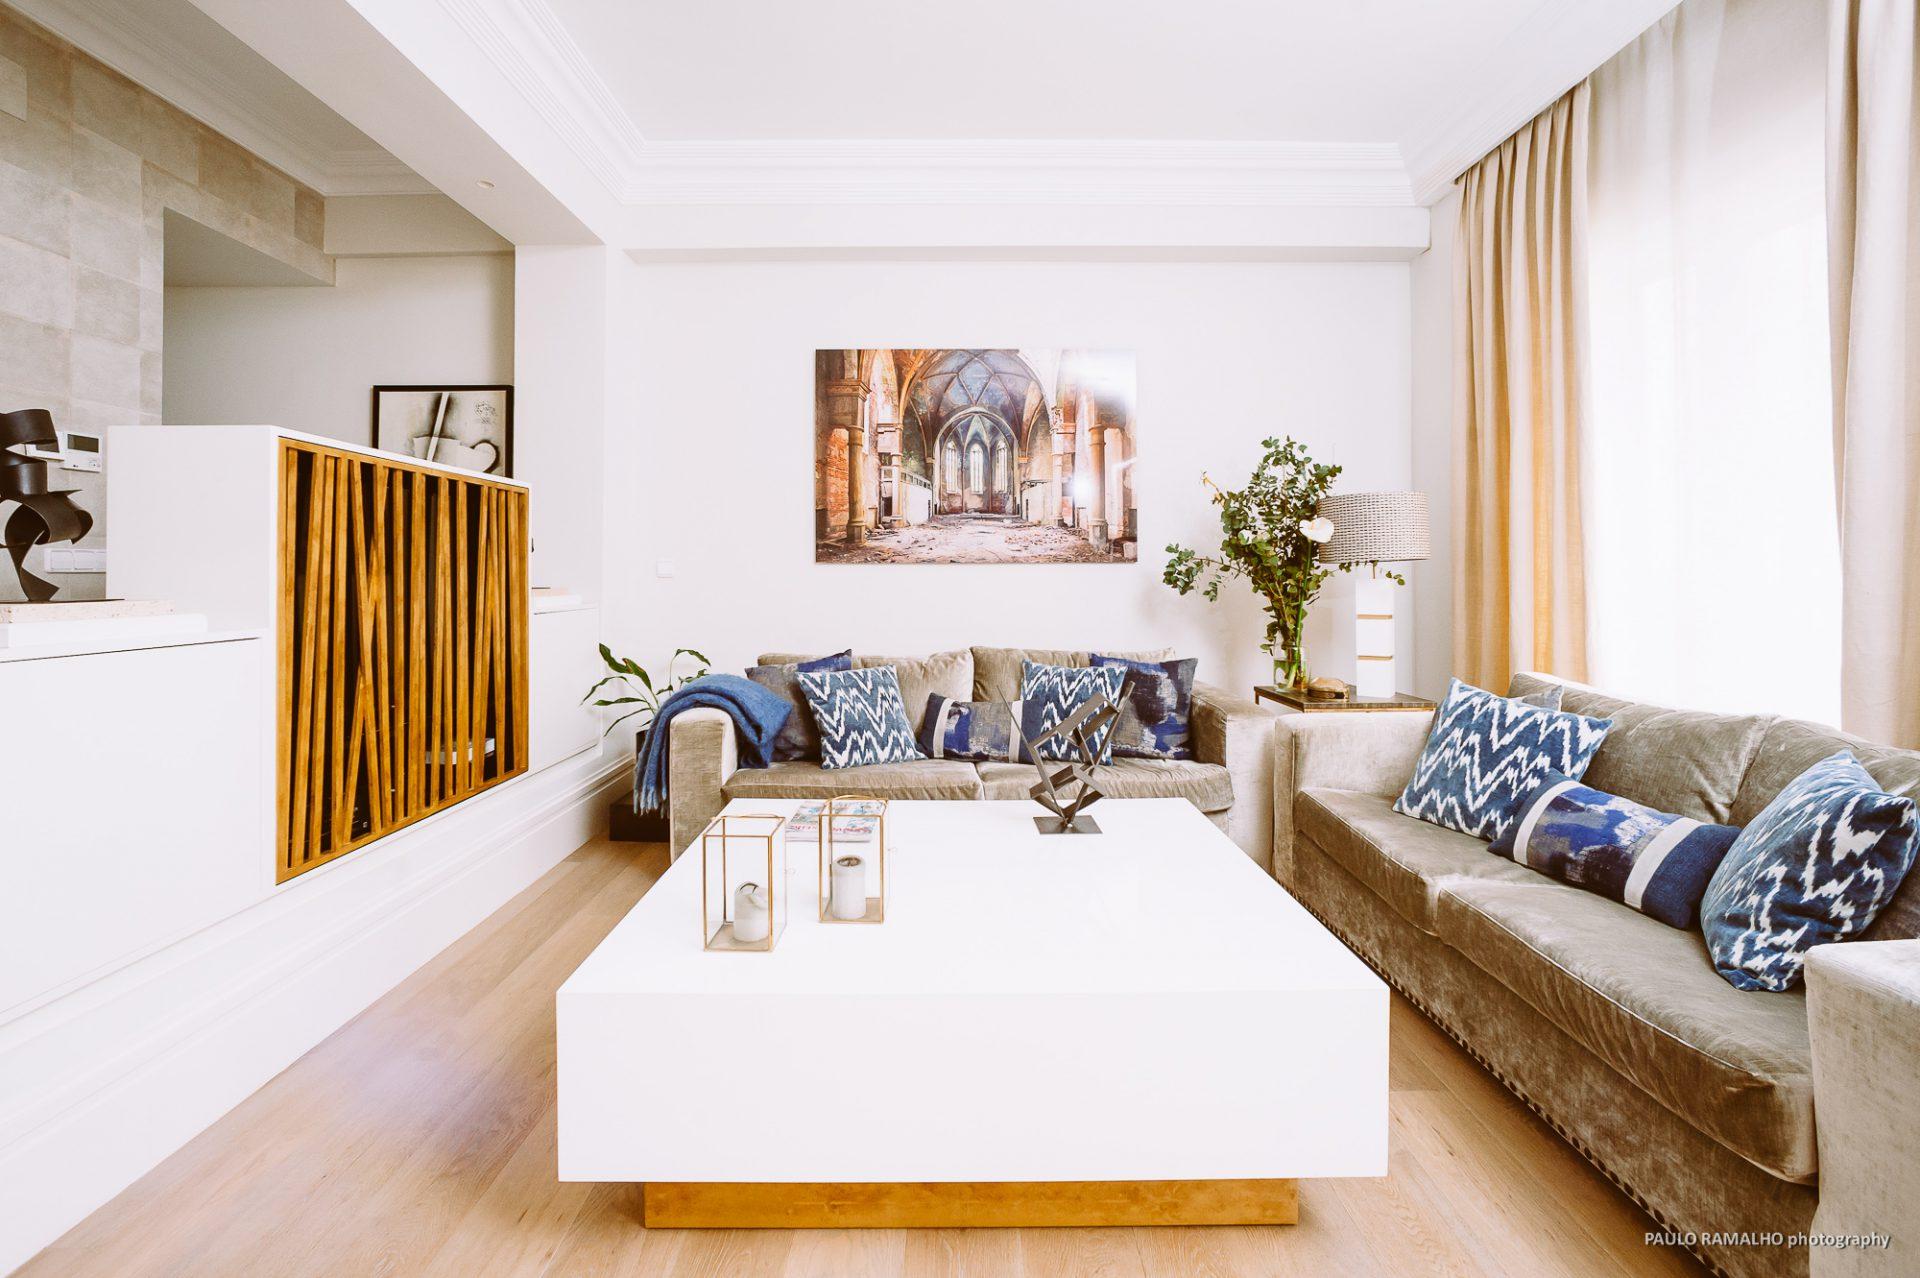 Fotografías de Interiores para Houzz | Paulo Ramalho fotógrafo España